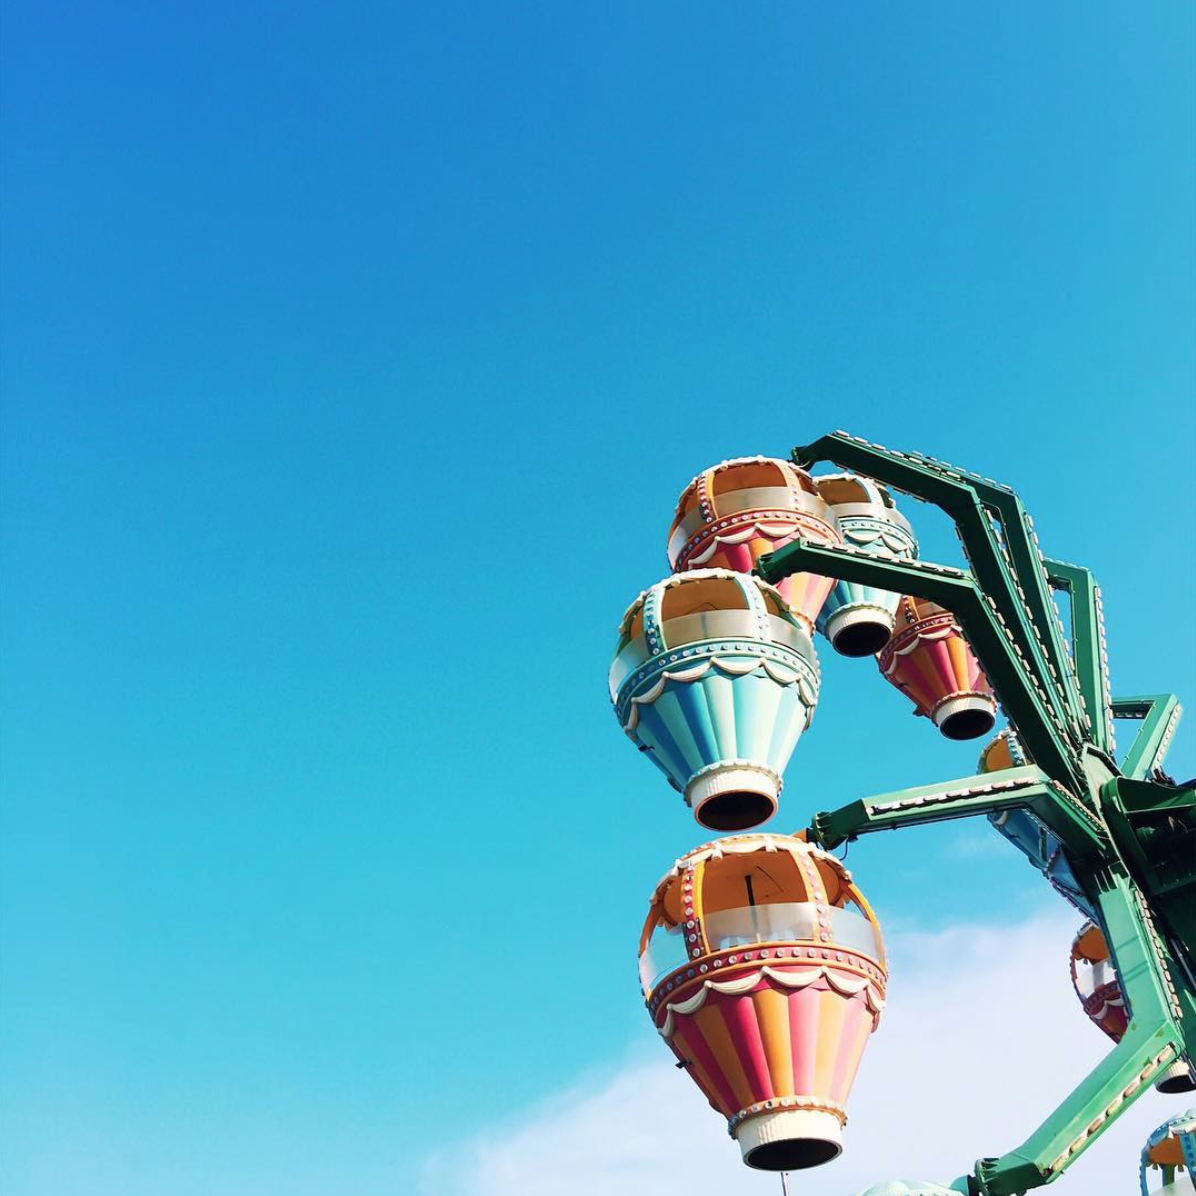 amy_chen_design_adventureland_long_island_ny_ferris_wheel_amusement_park